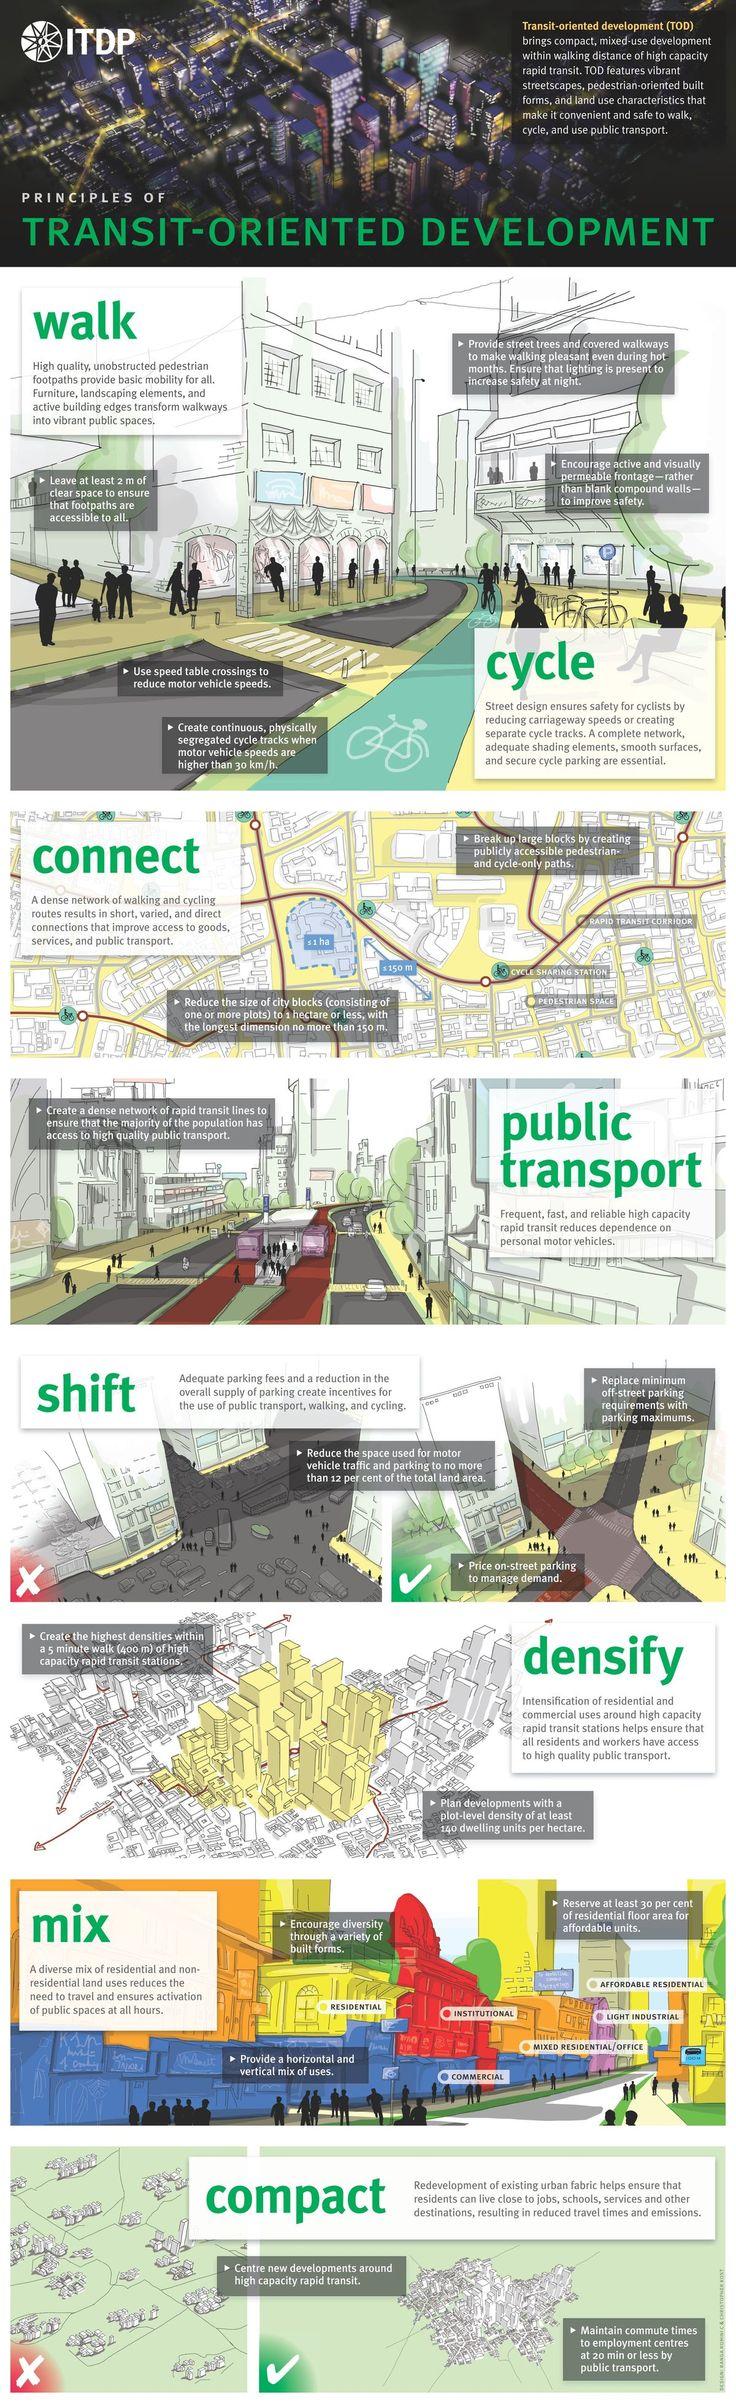 Transit Oriented Development infographic